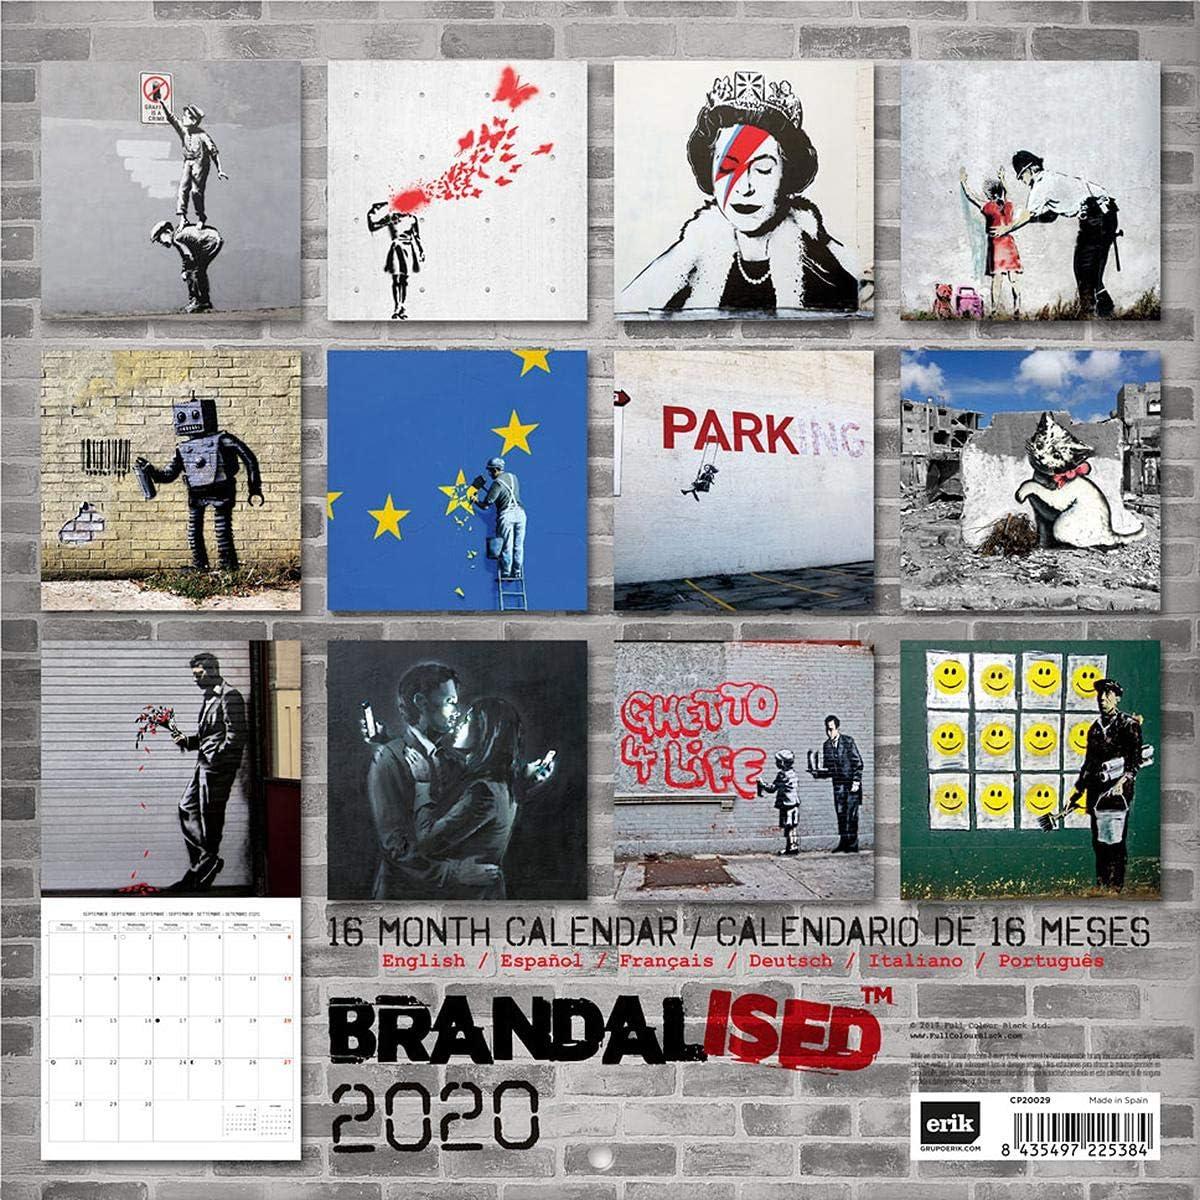 Banksy Brandalised - Calendario 2020, 16 Meses, versión Original ...